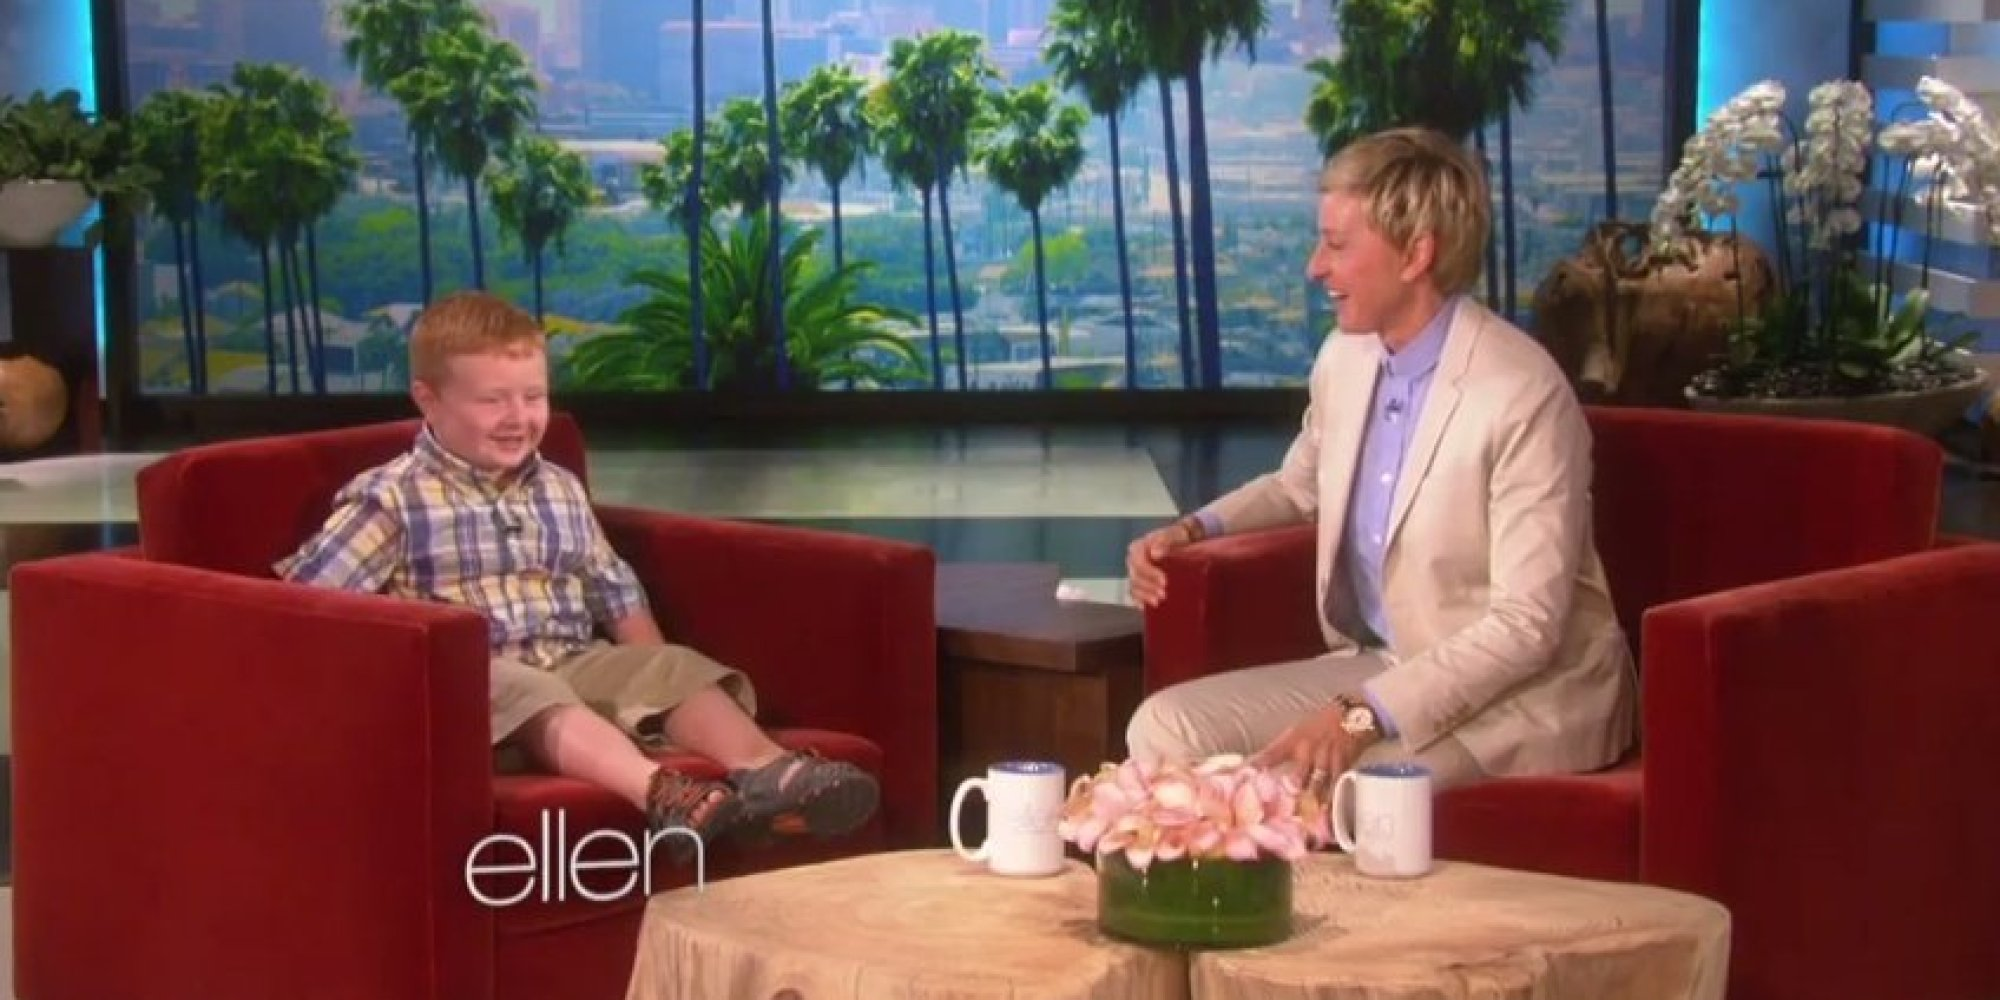 Ellen degeneres meets 39 apparently 39 kid noah ritter and apparently he 39 s awesome video - Ellen show address ...